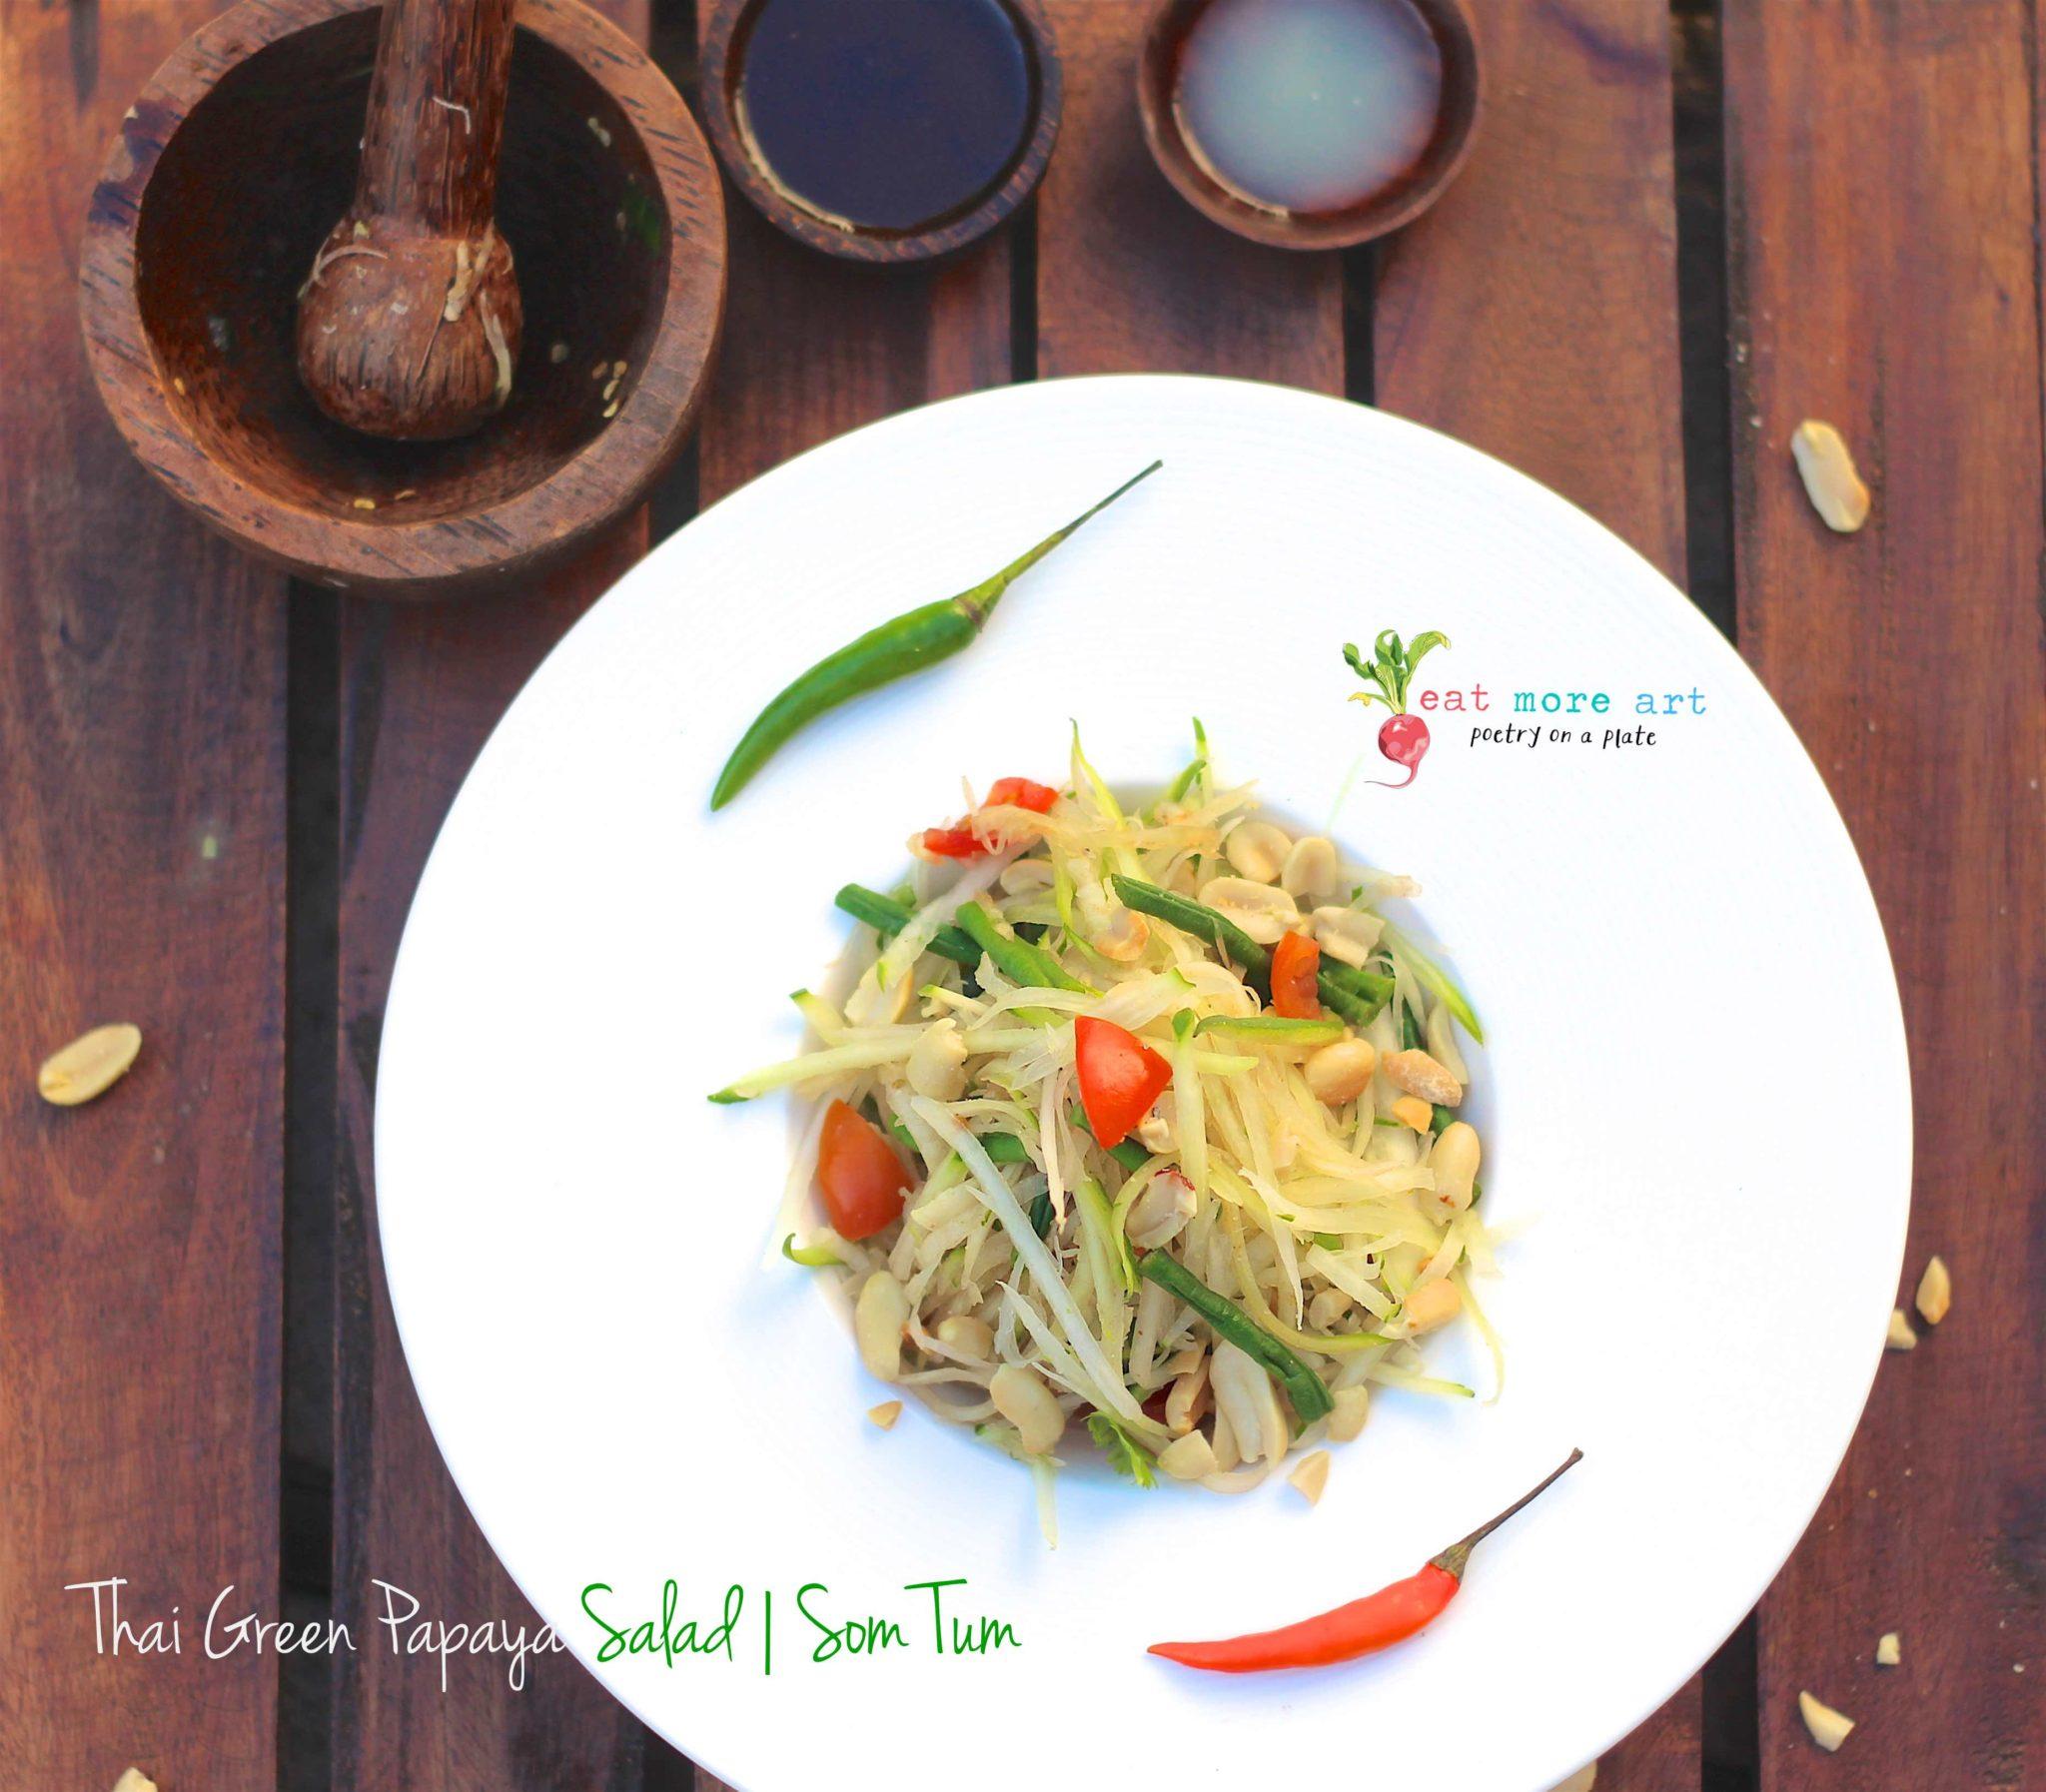 An overshead shot of Thai green papaya salad